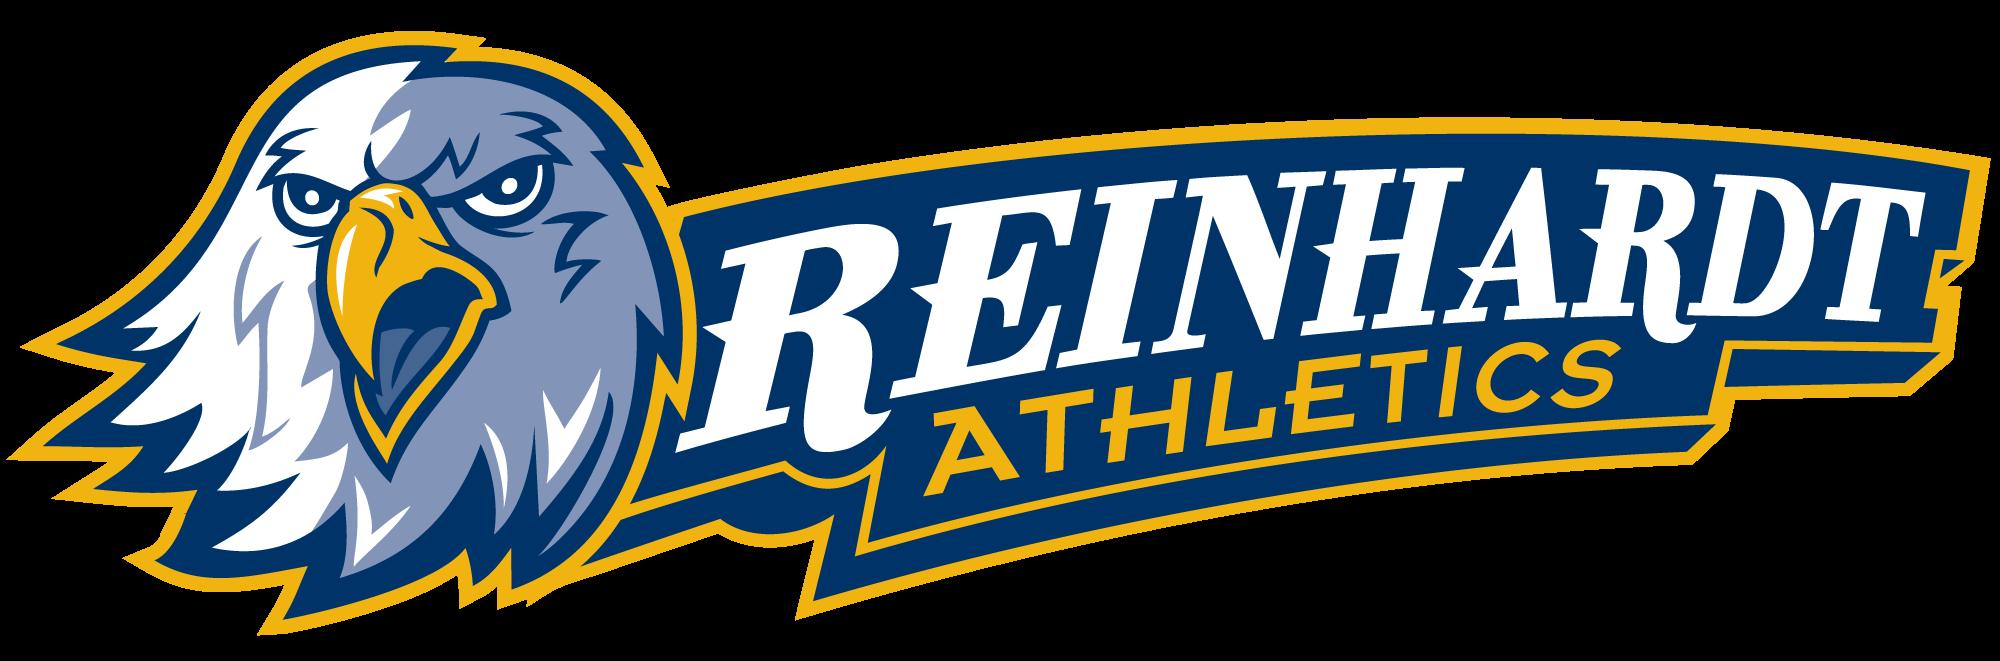 RU-athletics-head